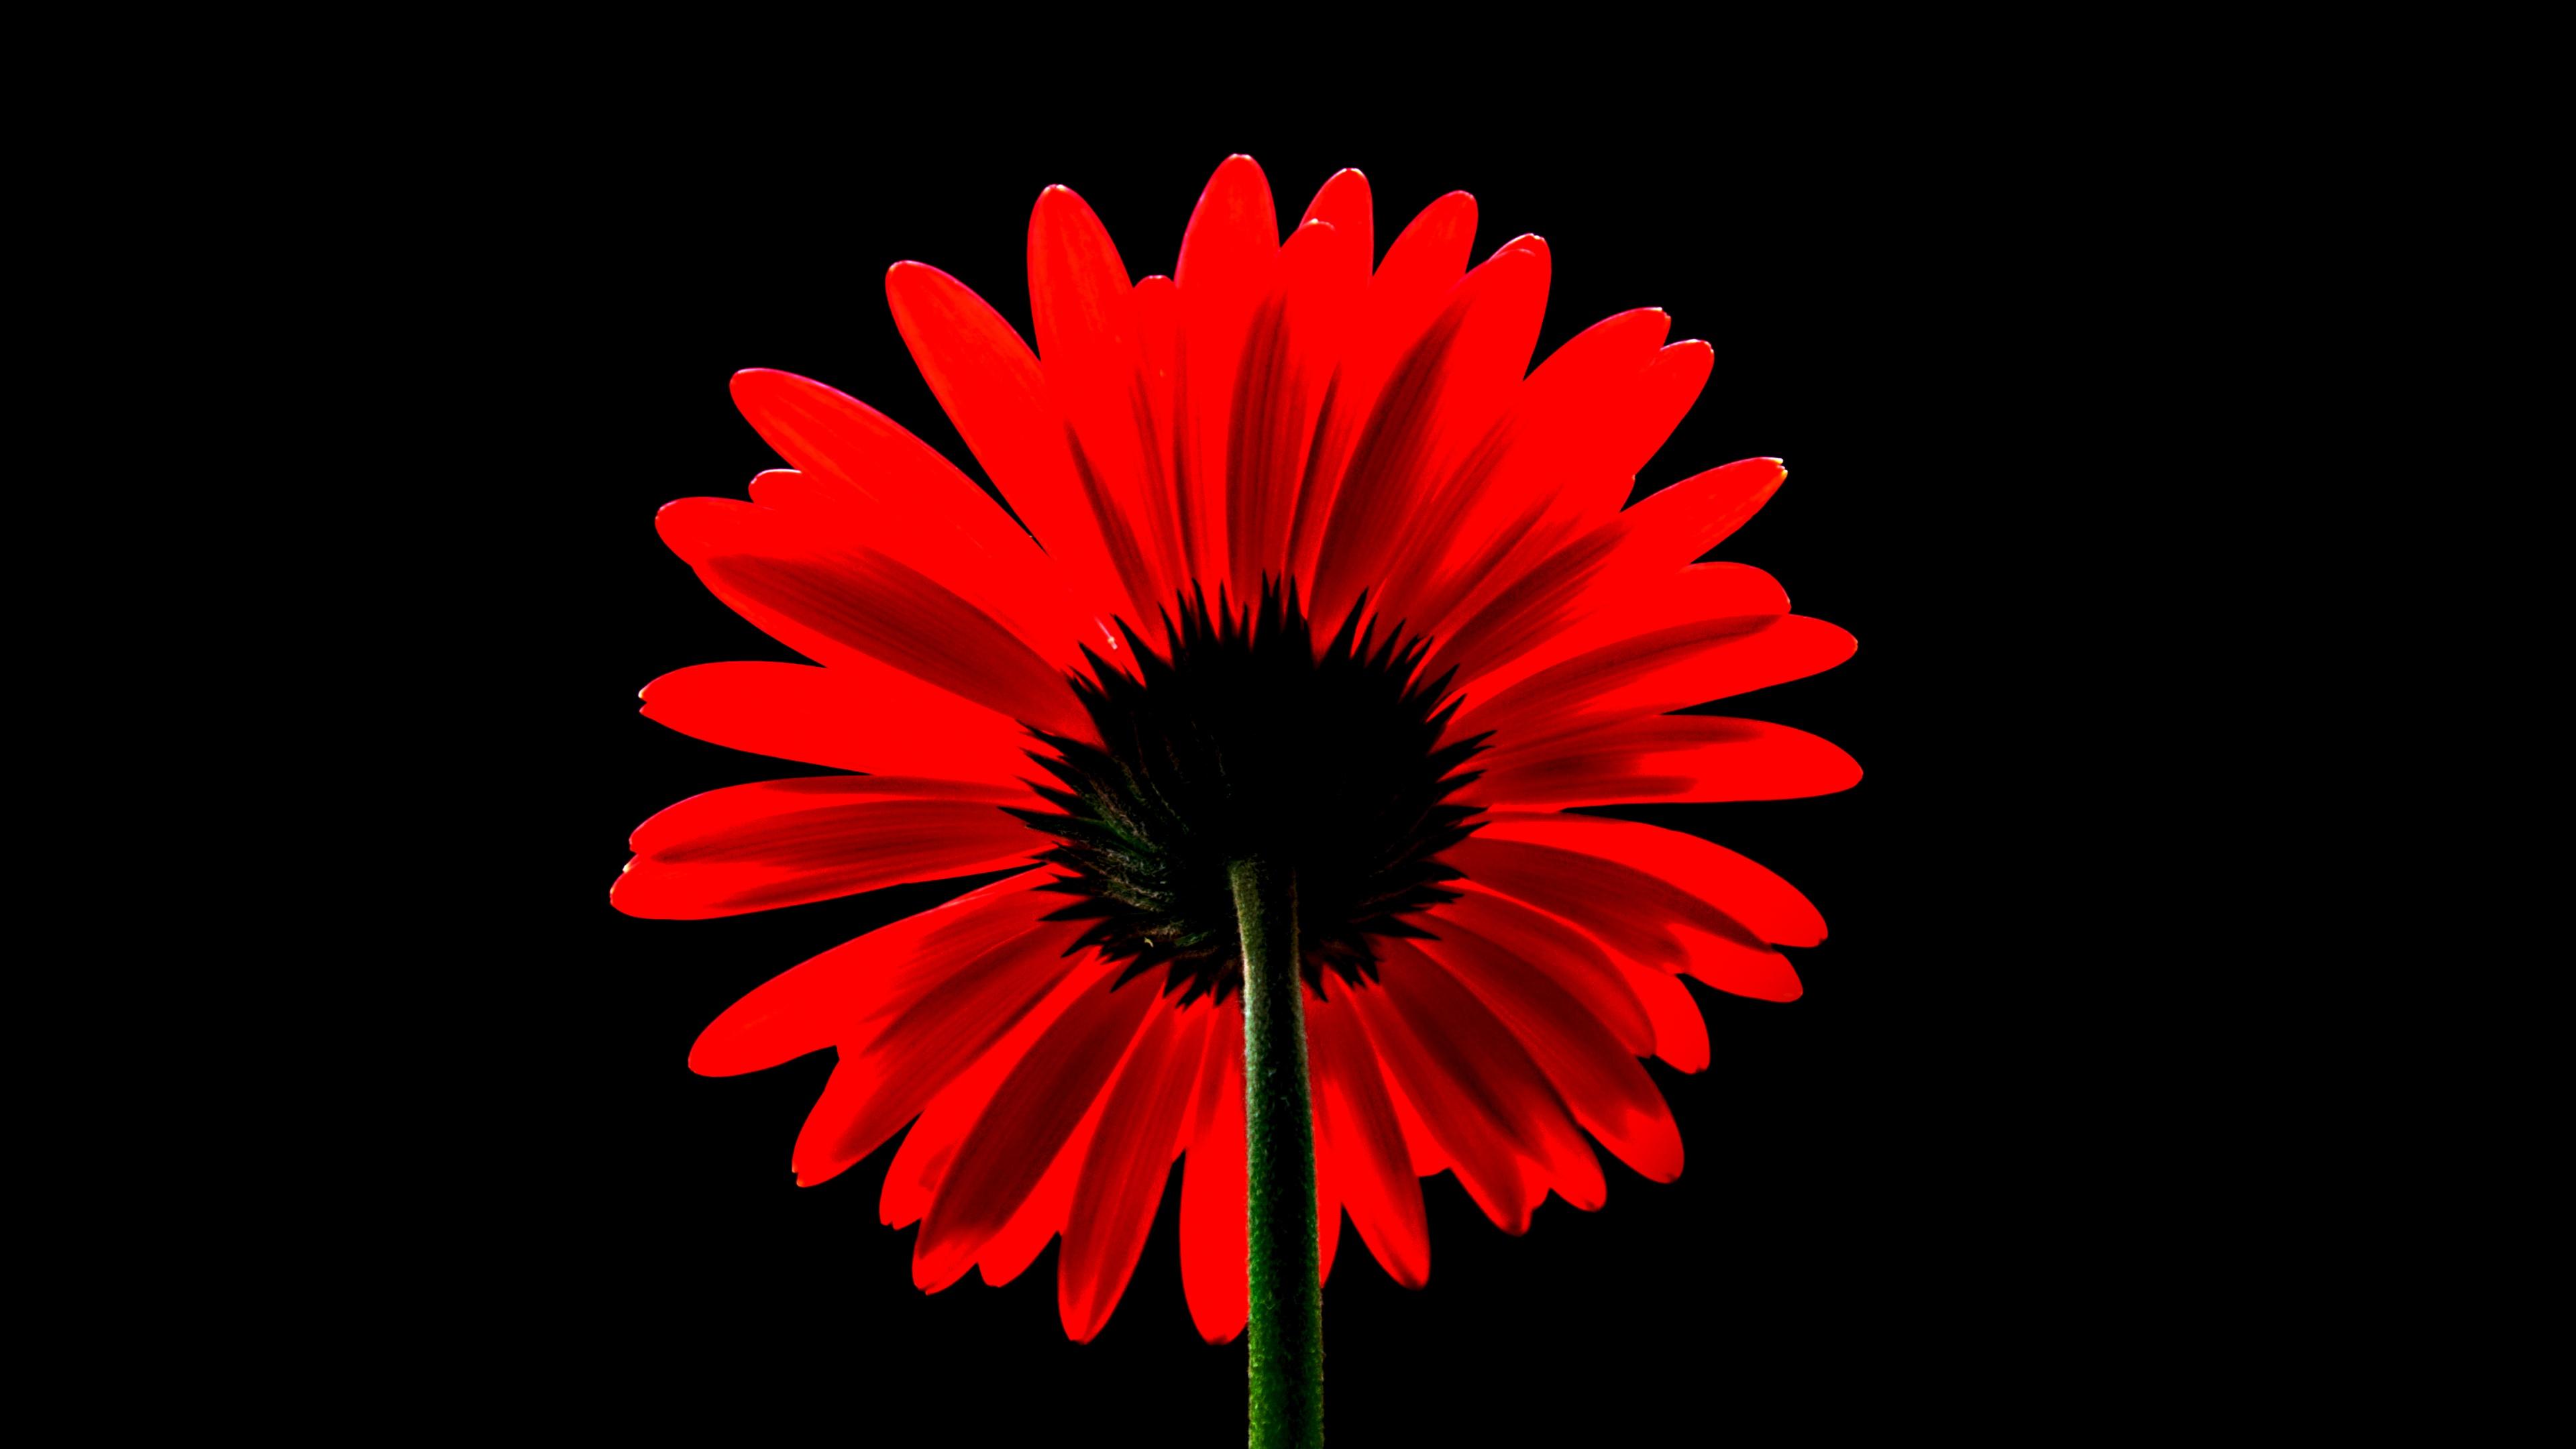 Red Gerbera Daisy 4k Wallpaper Red Flower Black Background Red Daisy 5k Flowers 1811